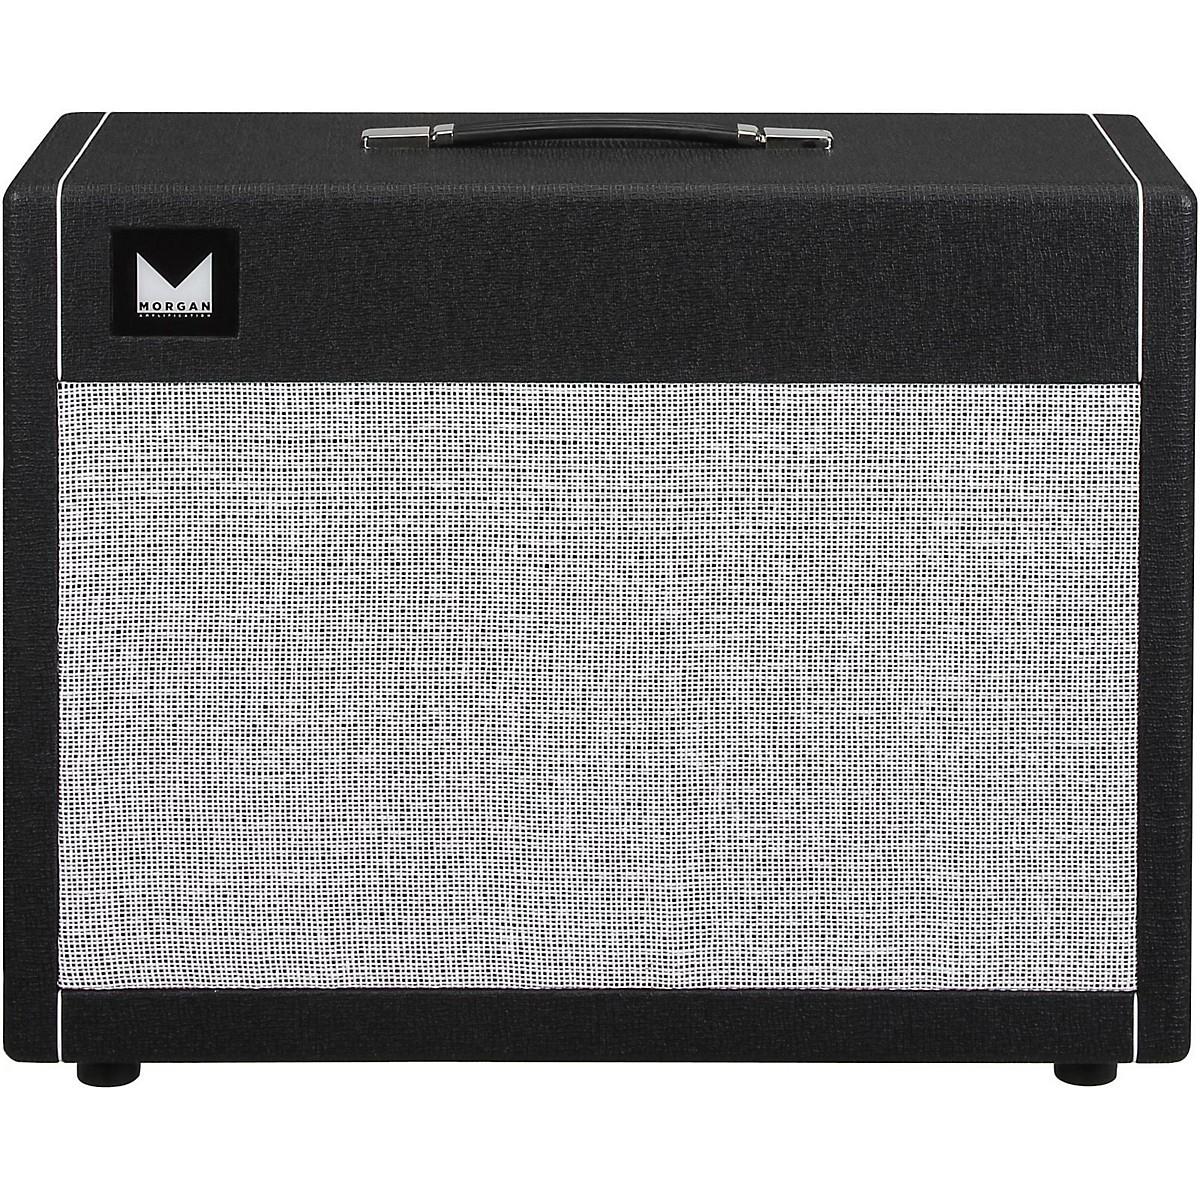 Morgan Amplification 2x12 Guitar Speaker Cabinet with Gold Speaker